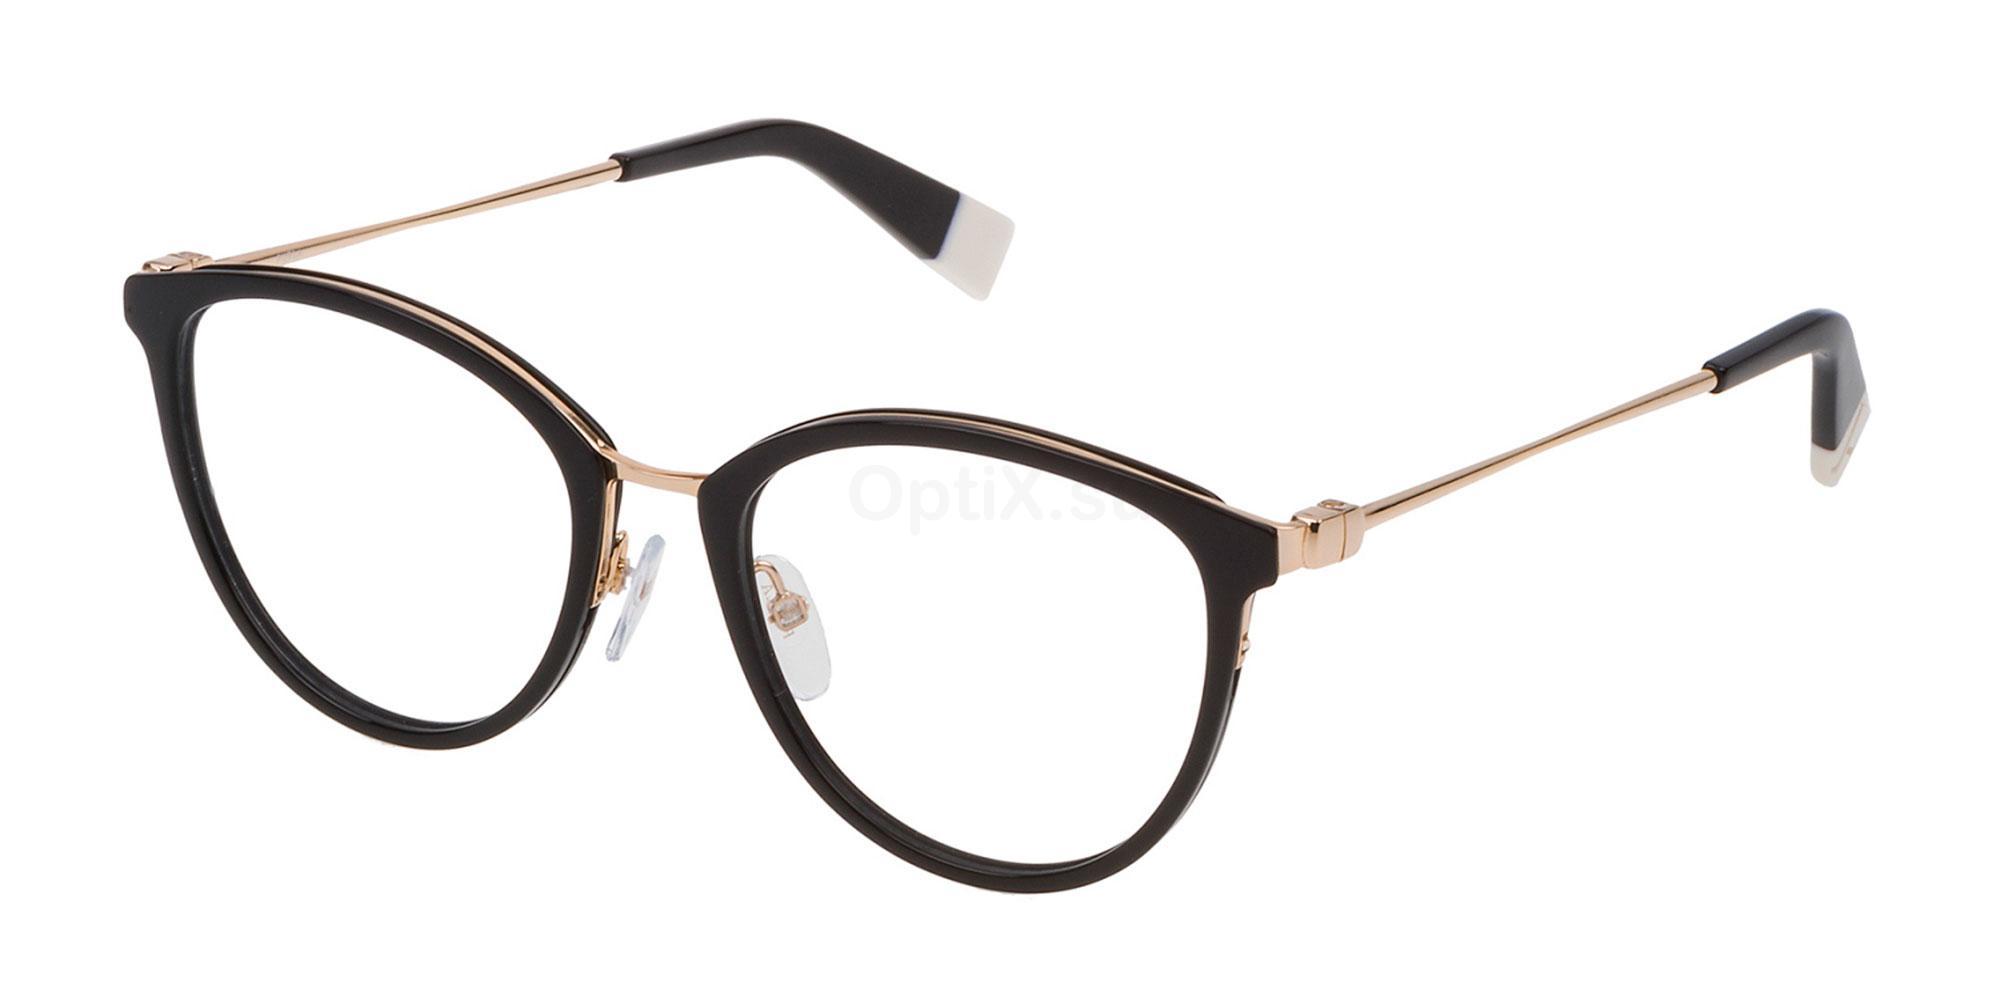 0700 VFU202 Glasses, Furla